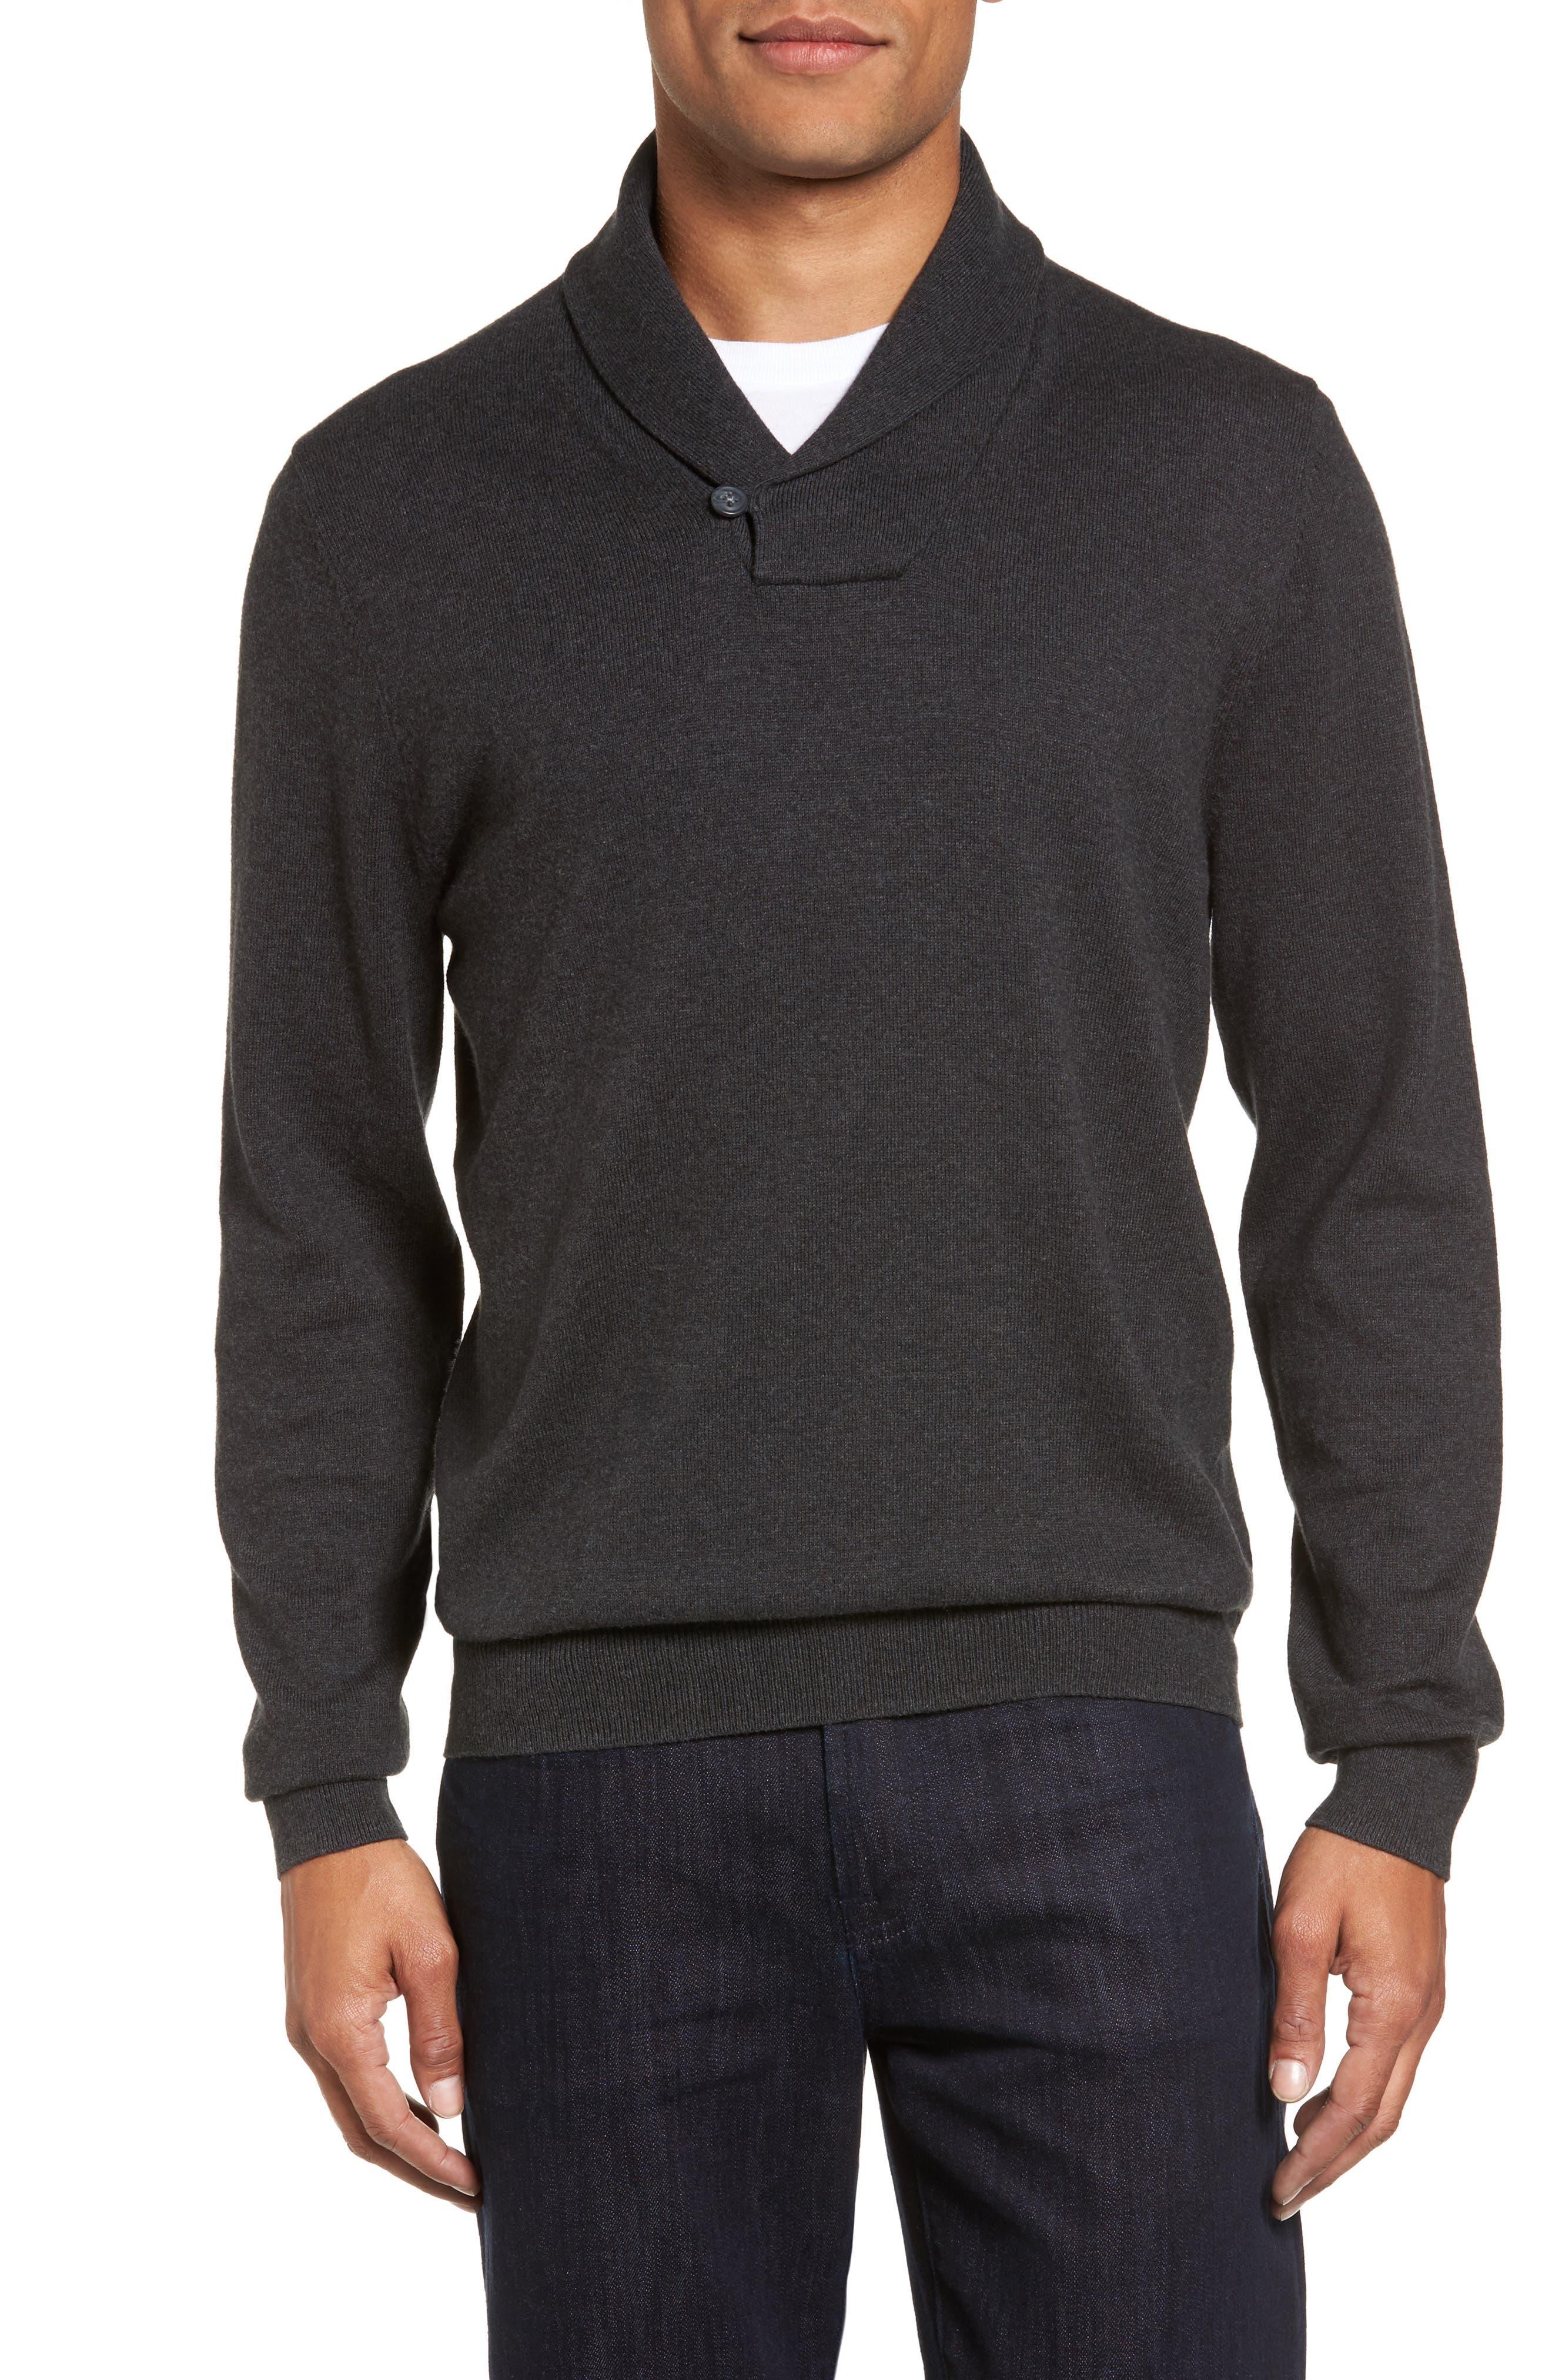 Alternate Image 1 Selected - Nordstrom Men's Shop Shawl Collar Sweater (Big)